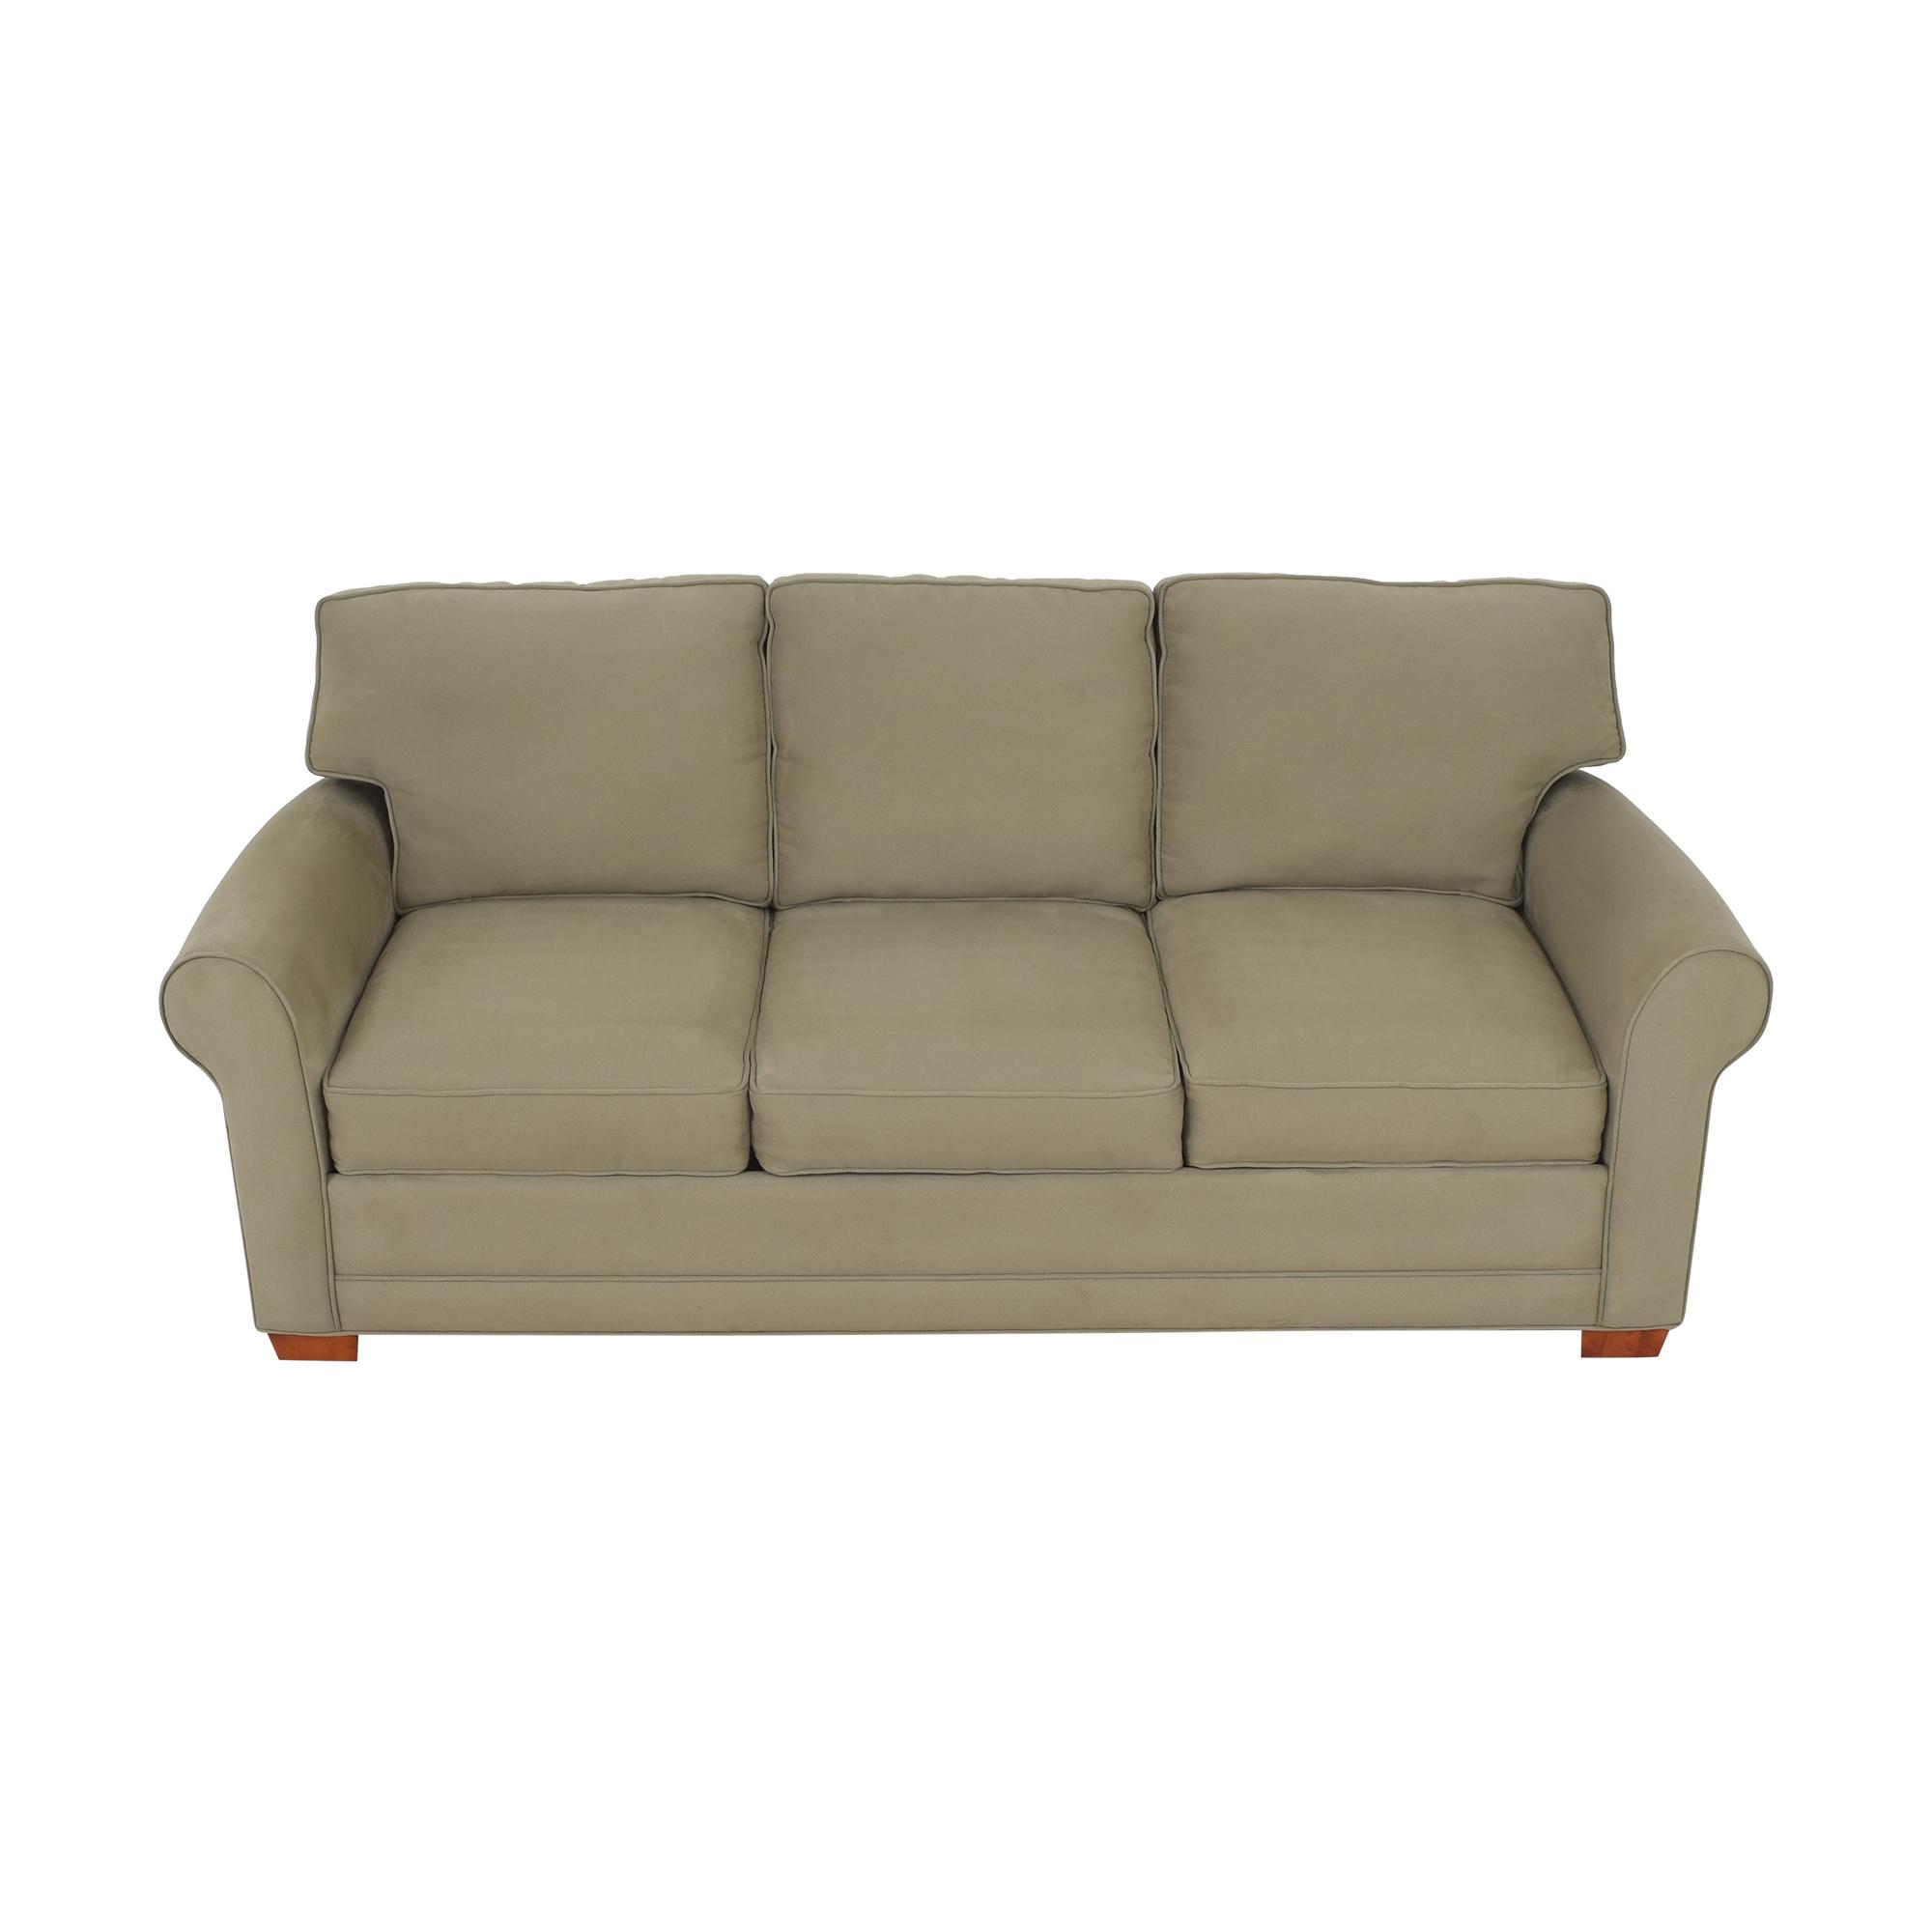 Raymour & Flanigan Raymour & Flanigan Roll Arm Sofa price